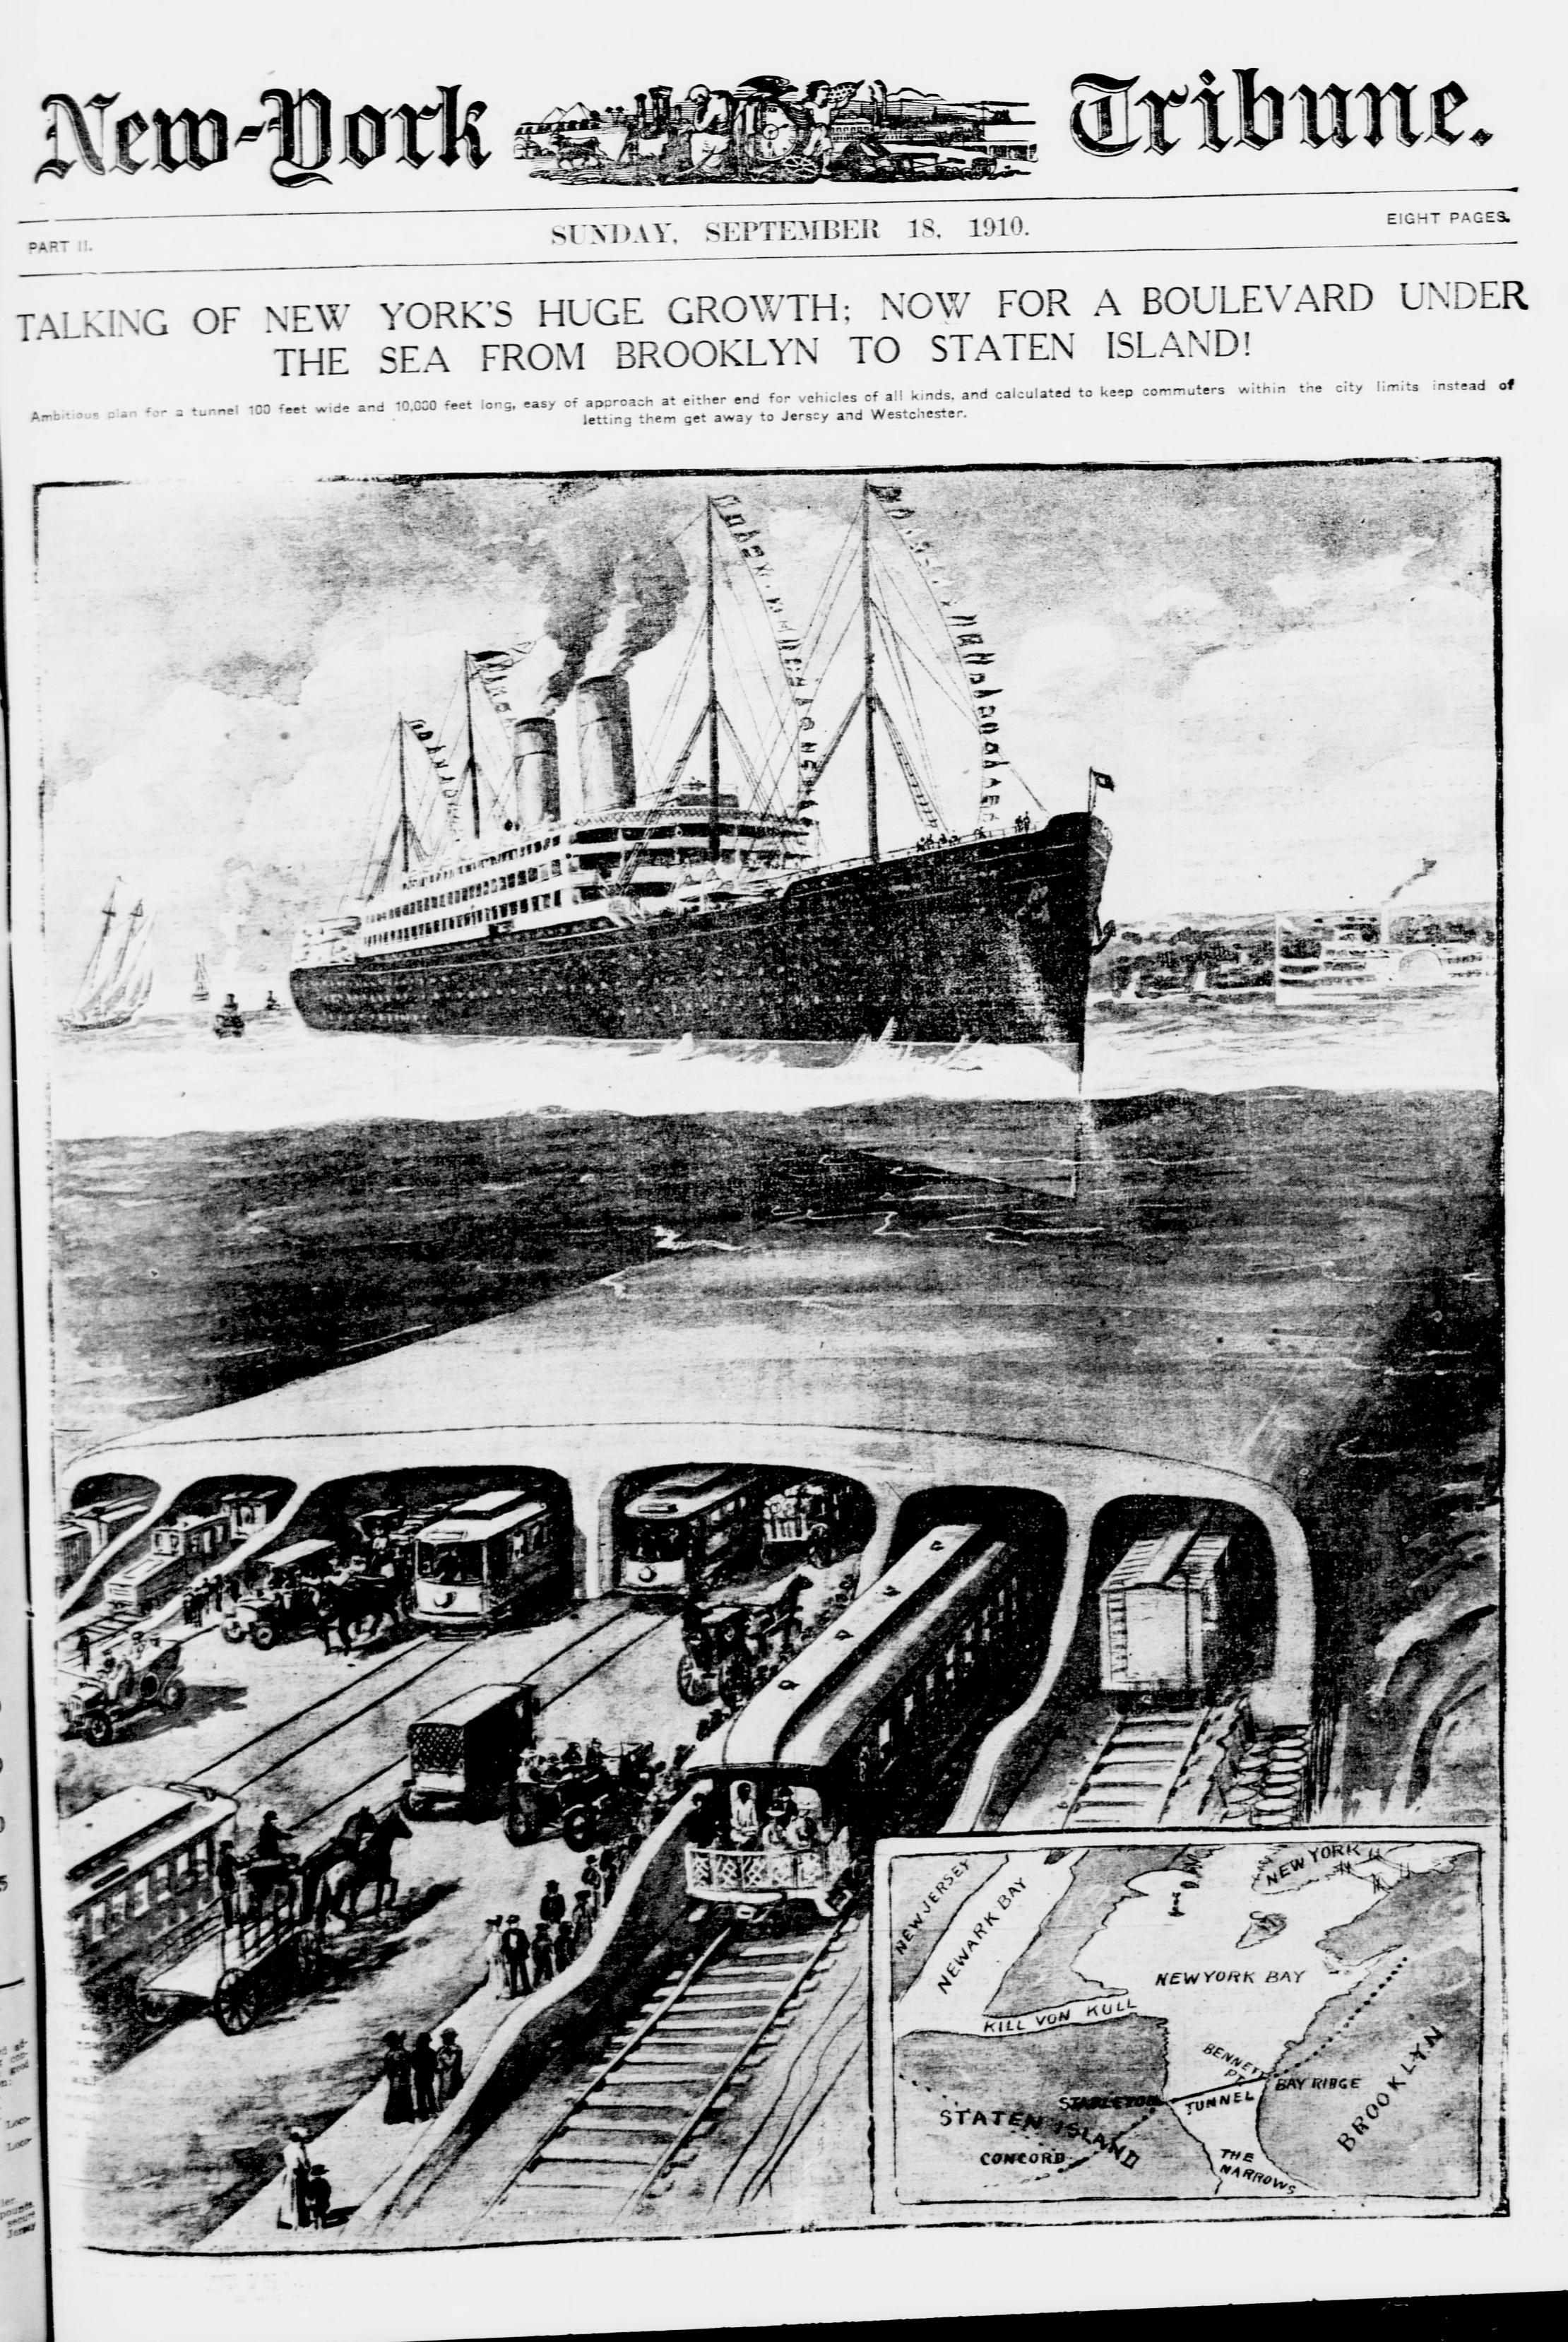 A BROOKLYN BLVD. BENEATH THE SEA (1910) - The Brownstone